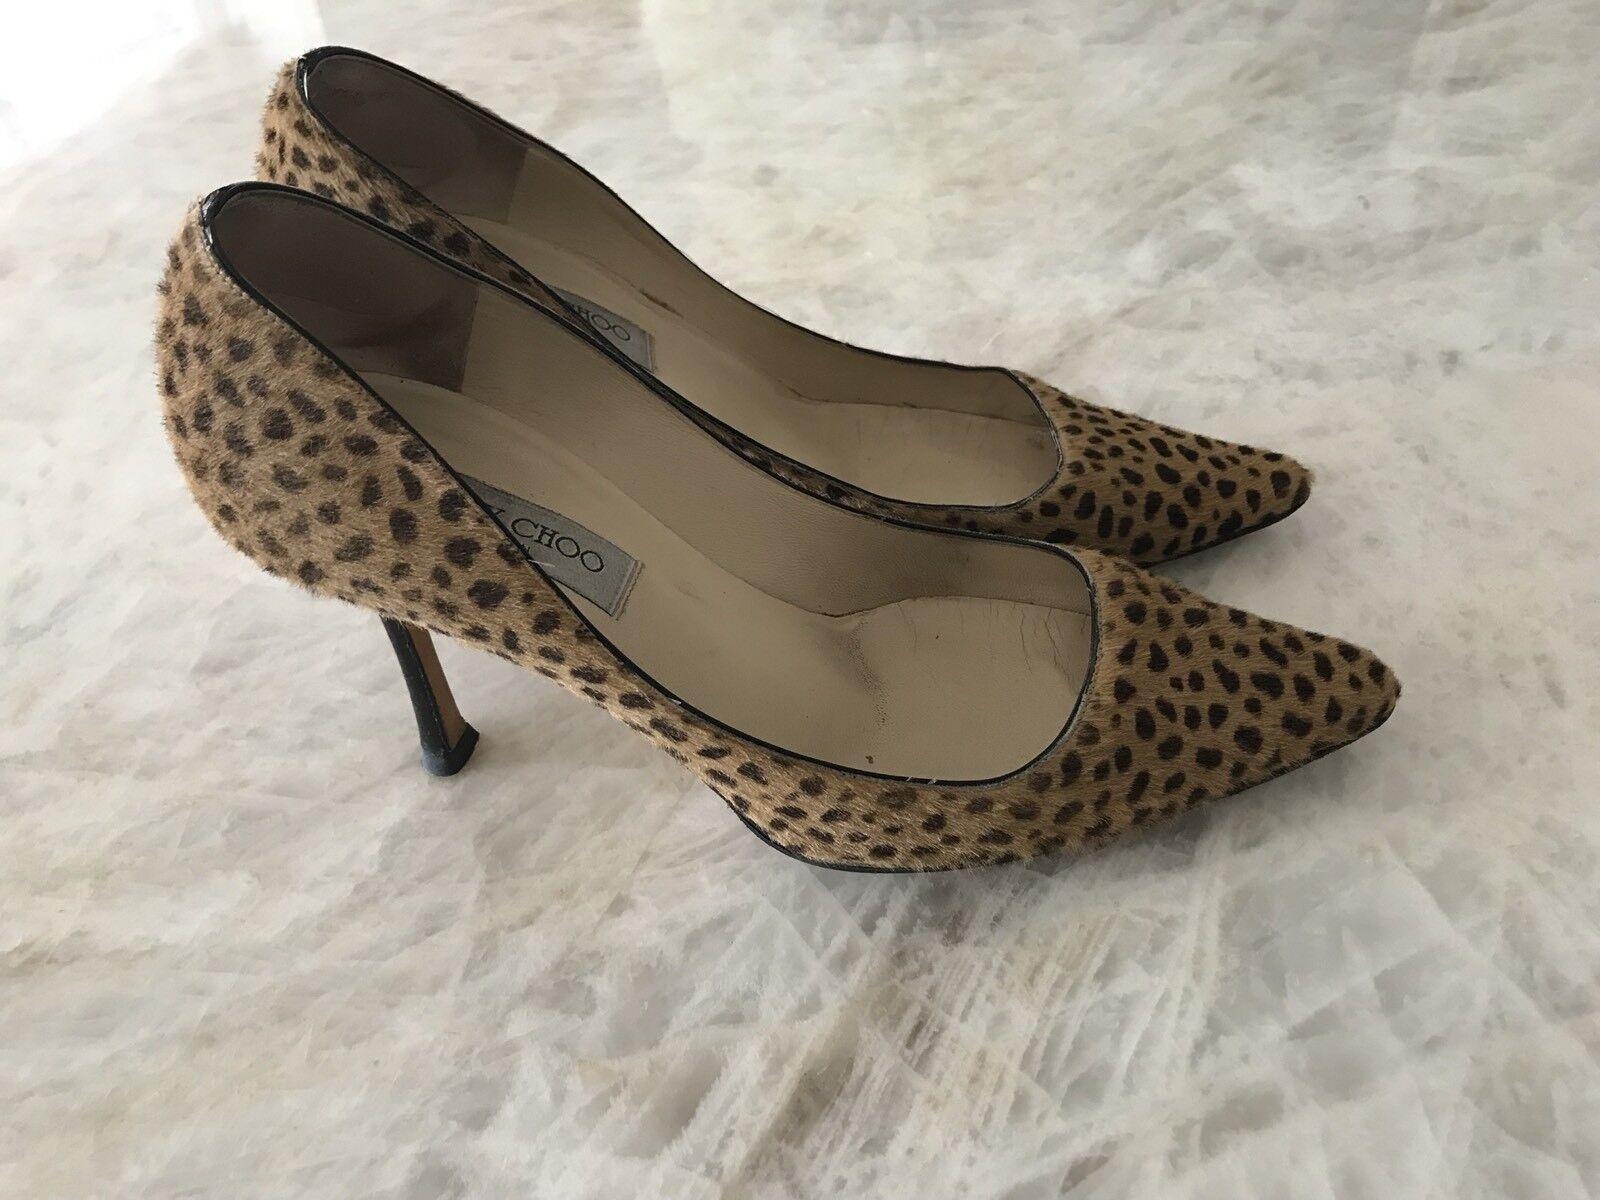 negozio di vendita outlet JIMMY JIMMY JIMMY CHOO Animal Leopard Print Calf Heels 39.5  vendite calde